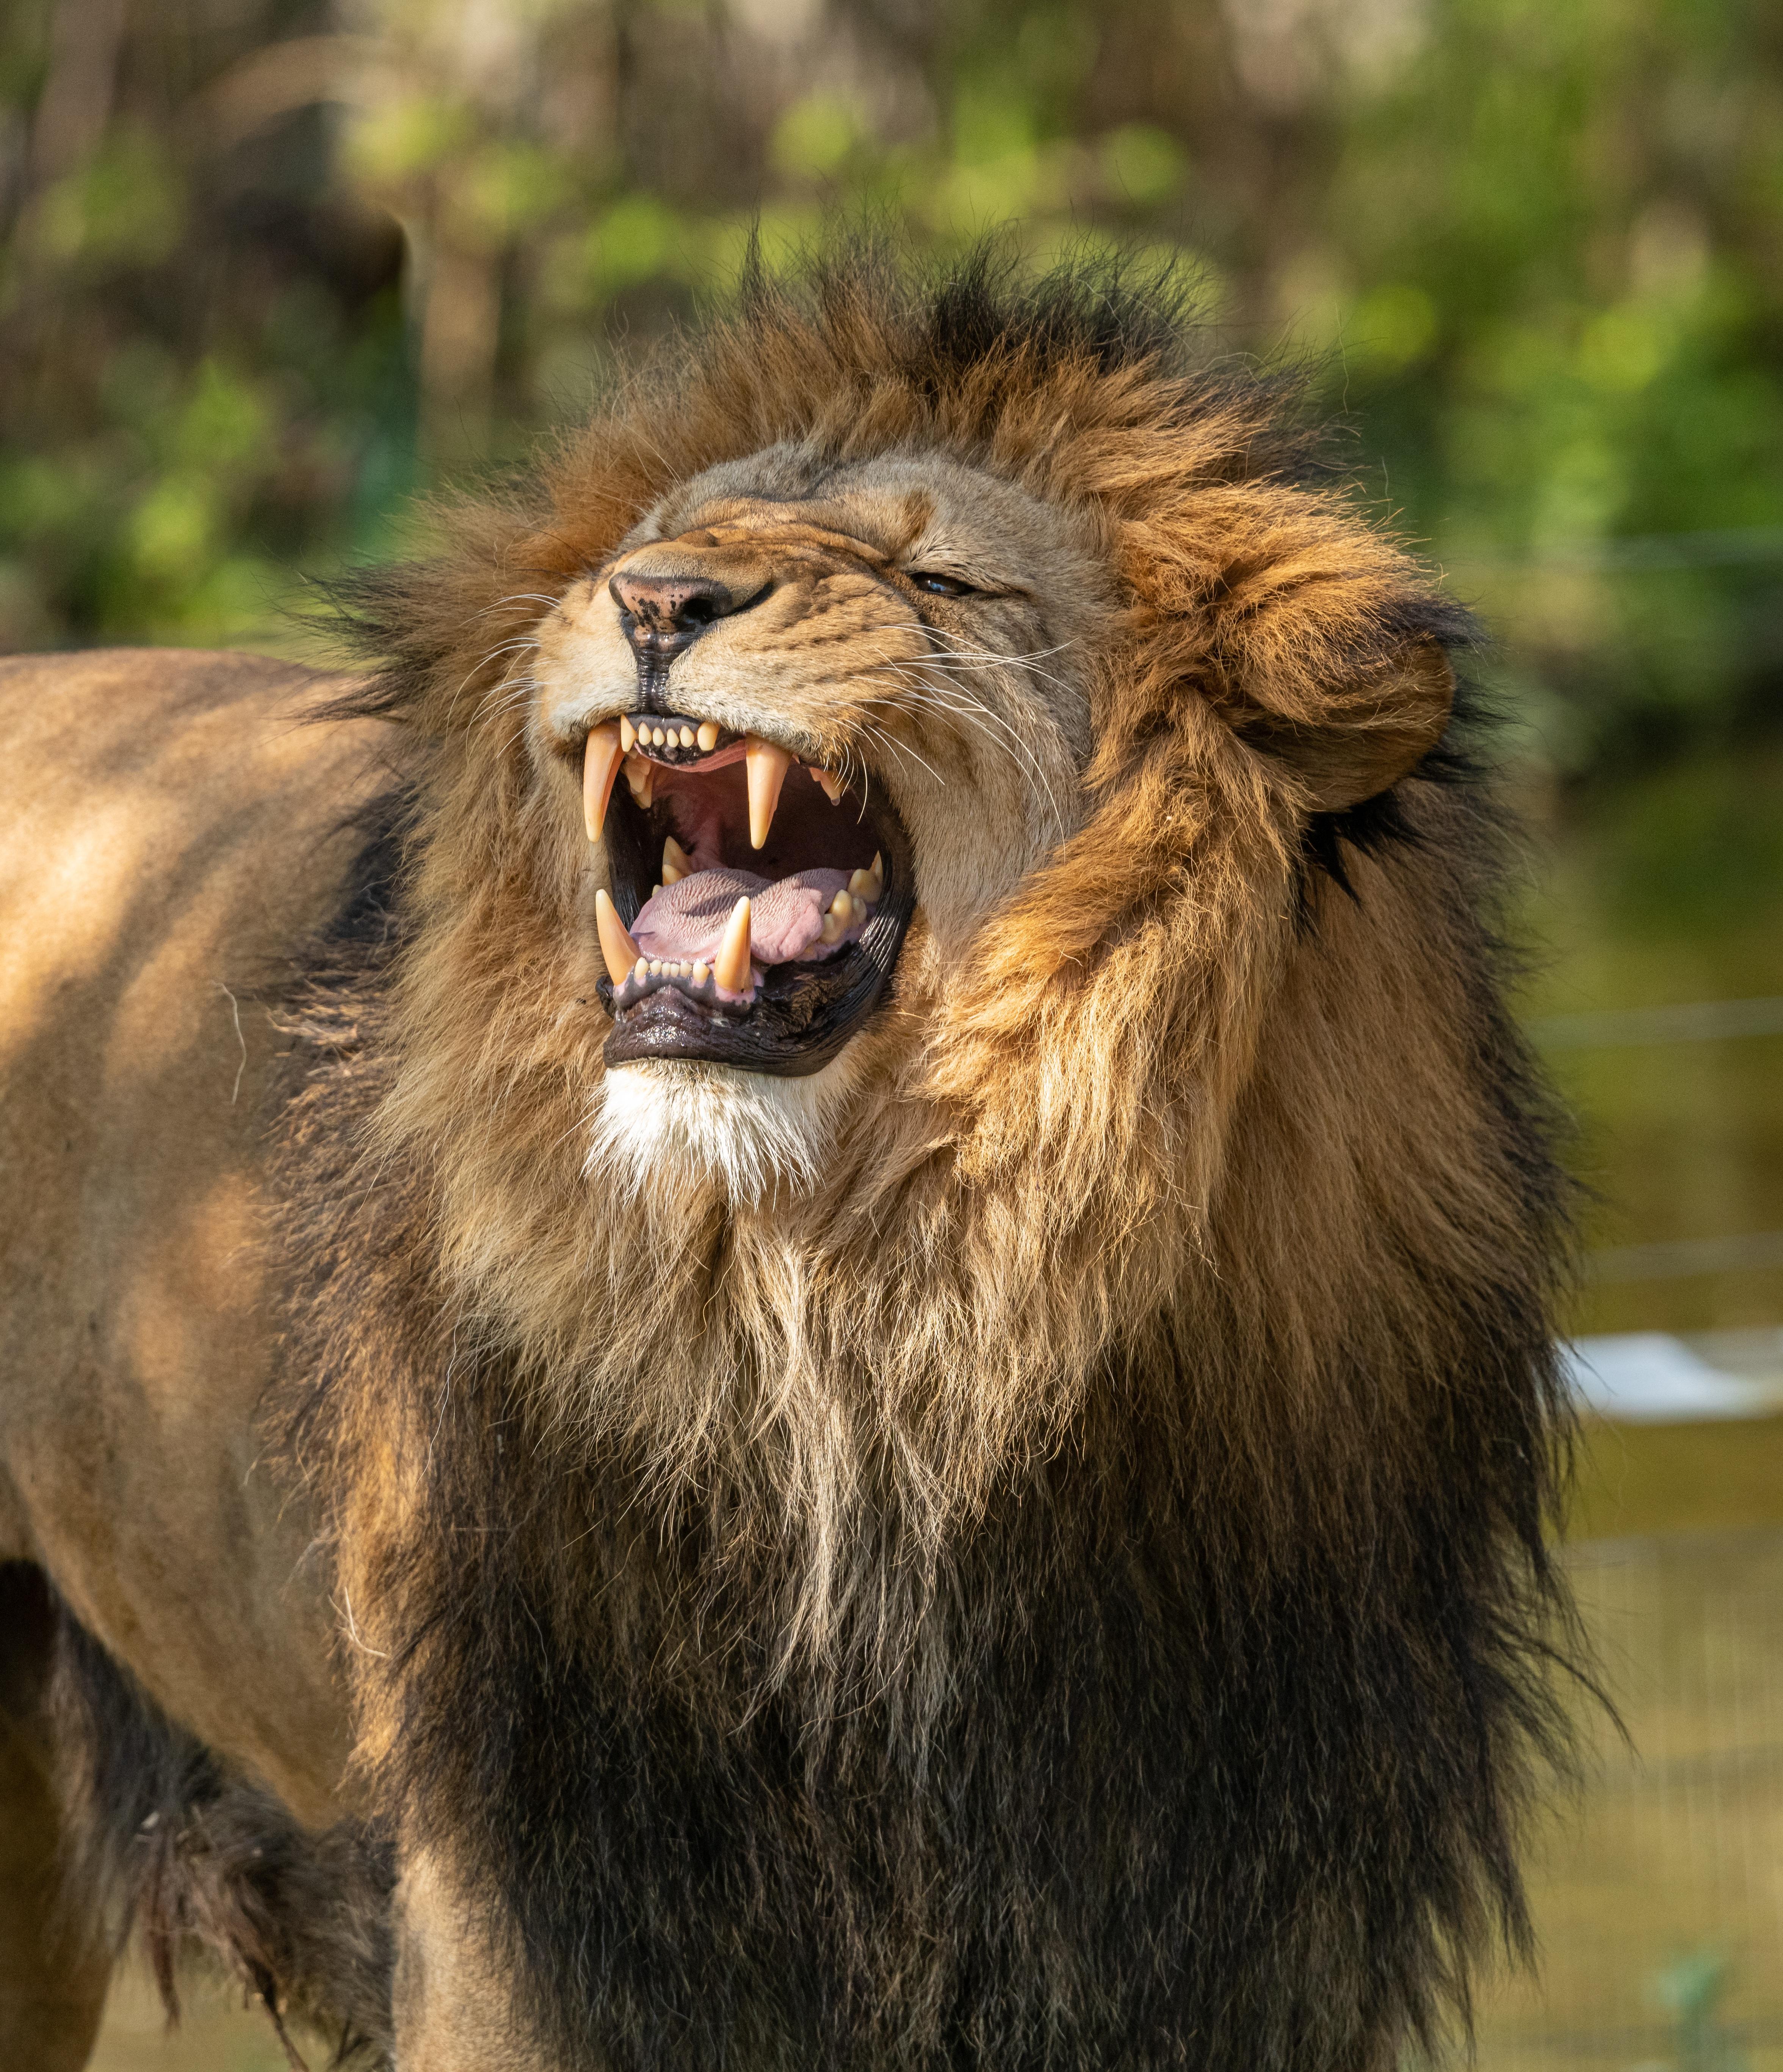 Photo Lions Roar animal 4704x5466 lion angry Animals